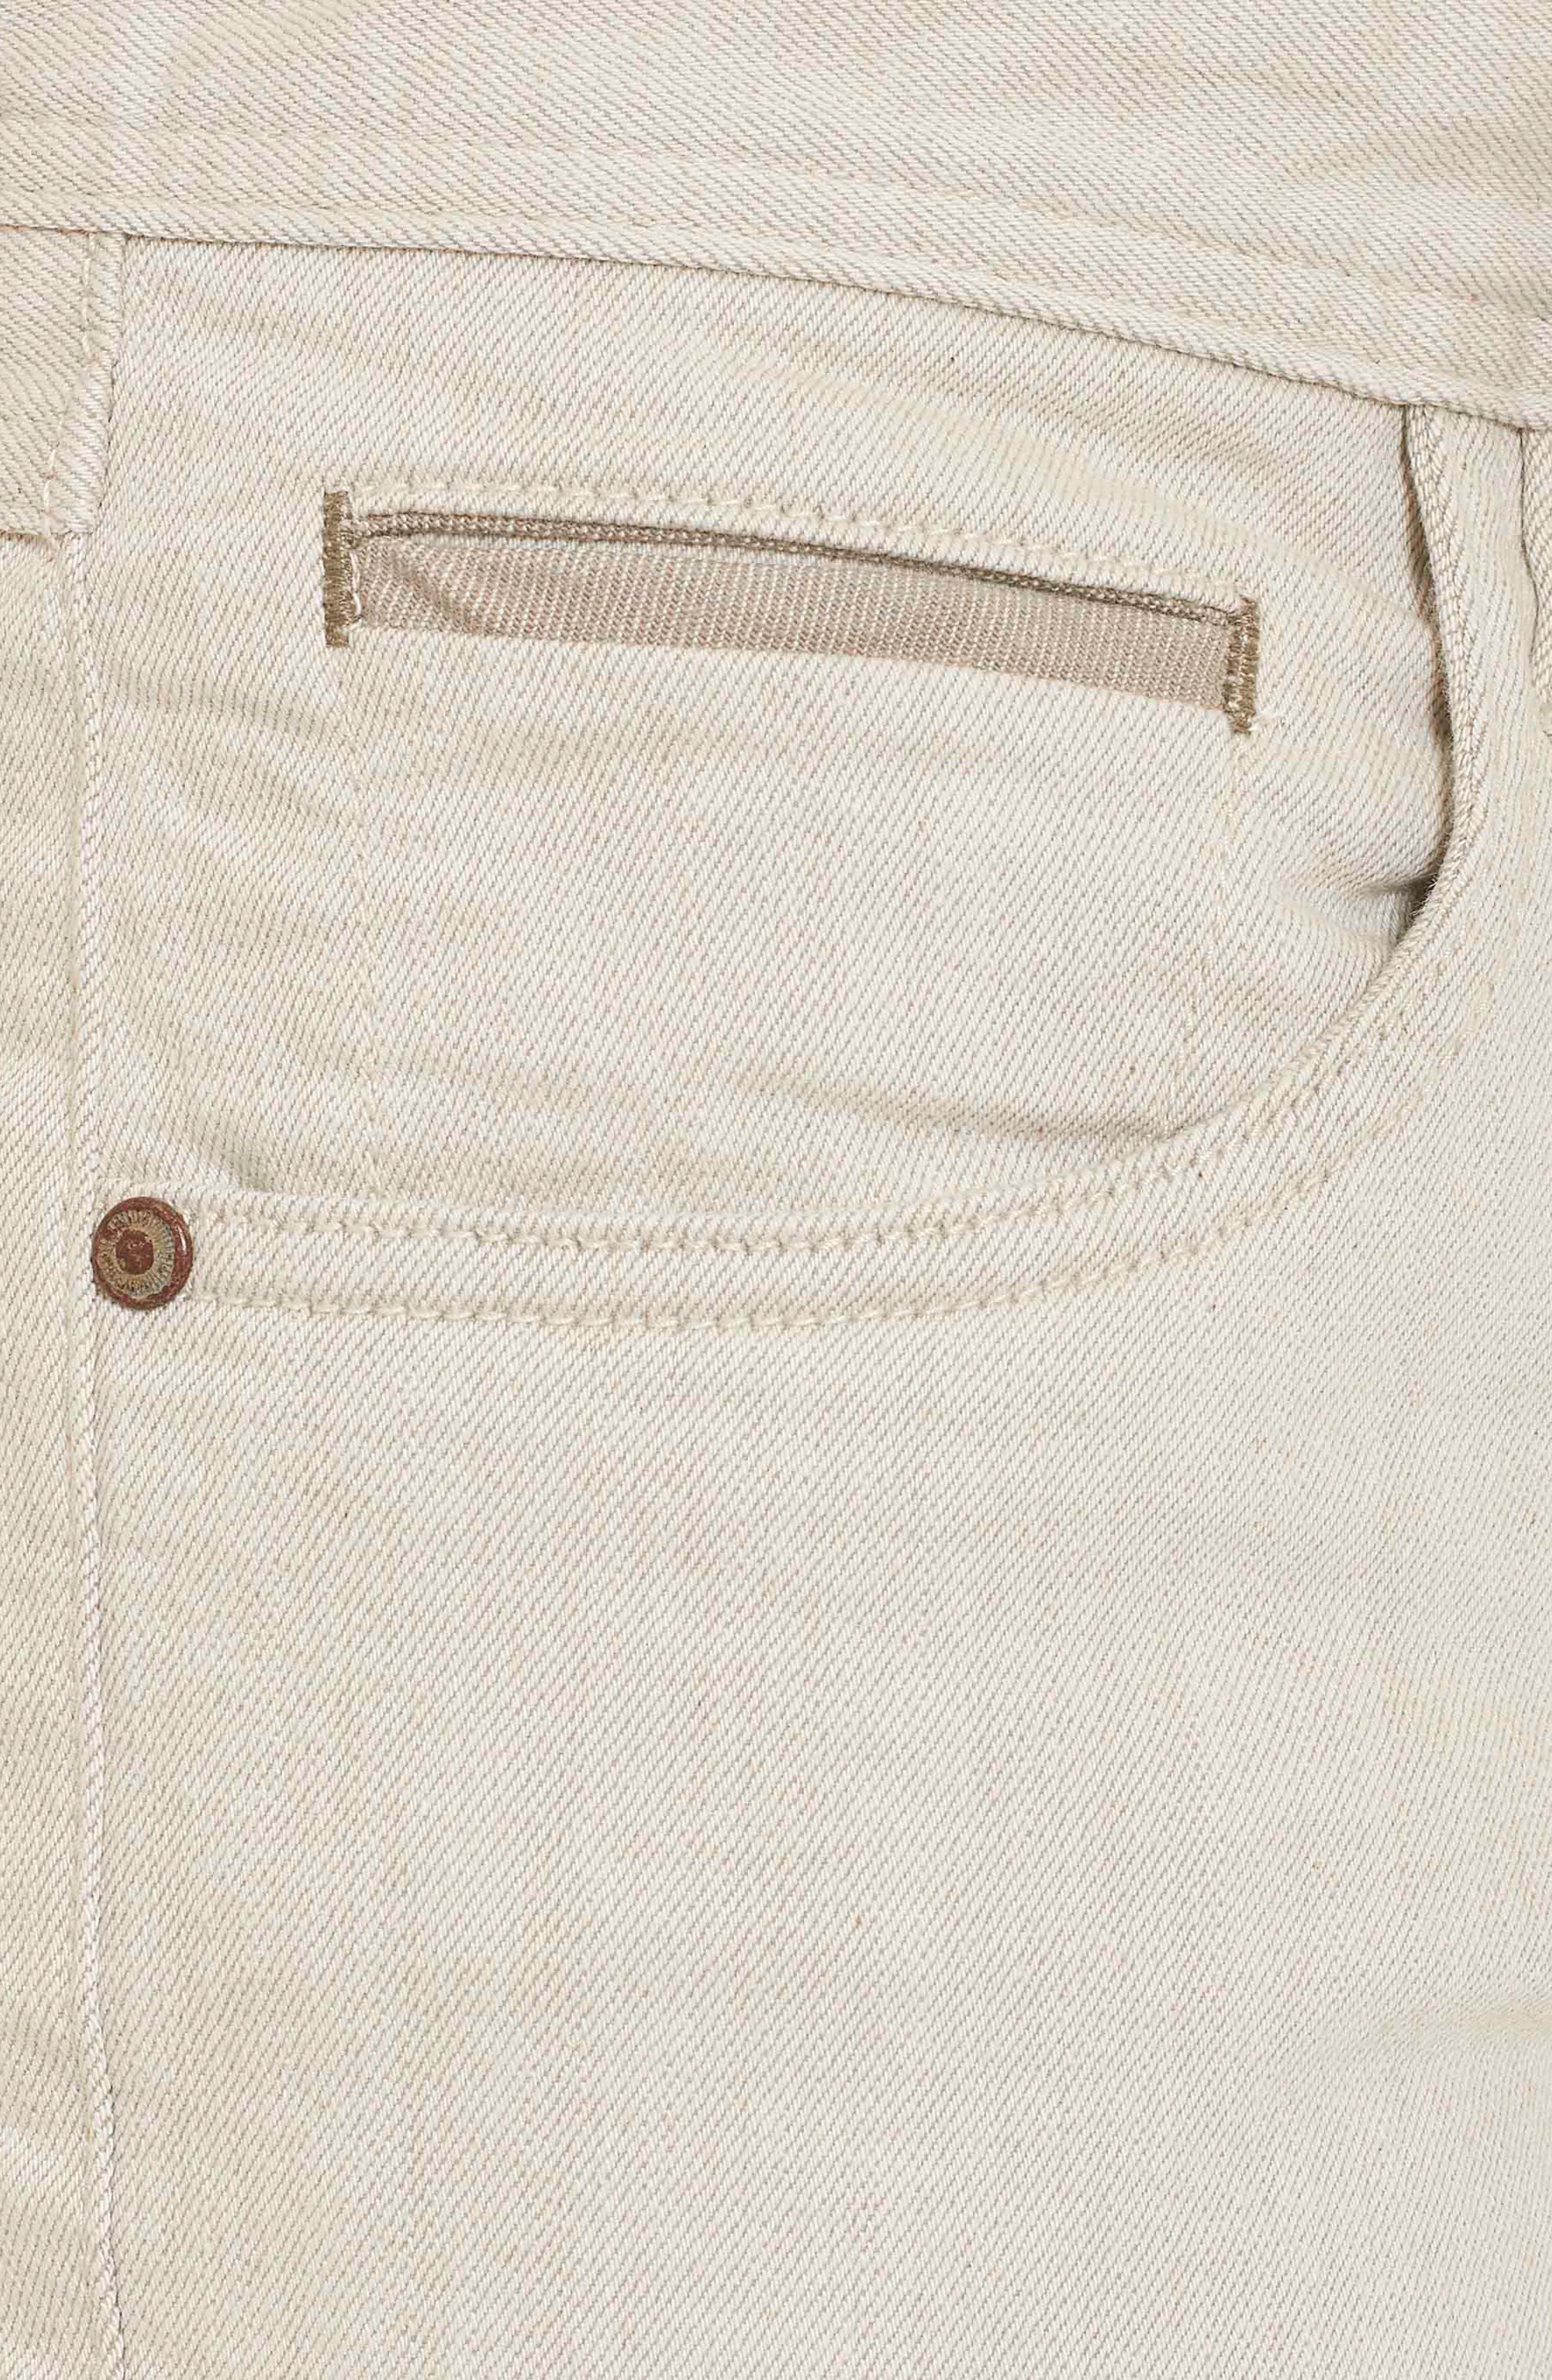 Alternate Image 4  - Robert Graham Gonzales Jeans (Stone)